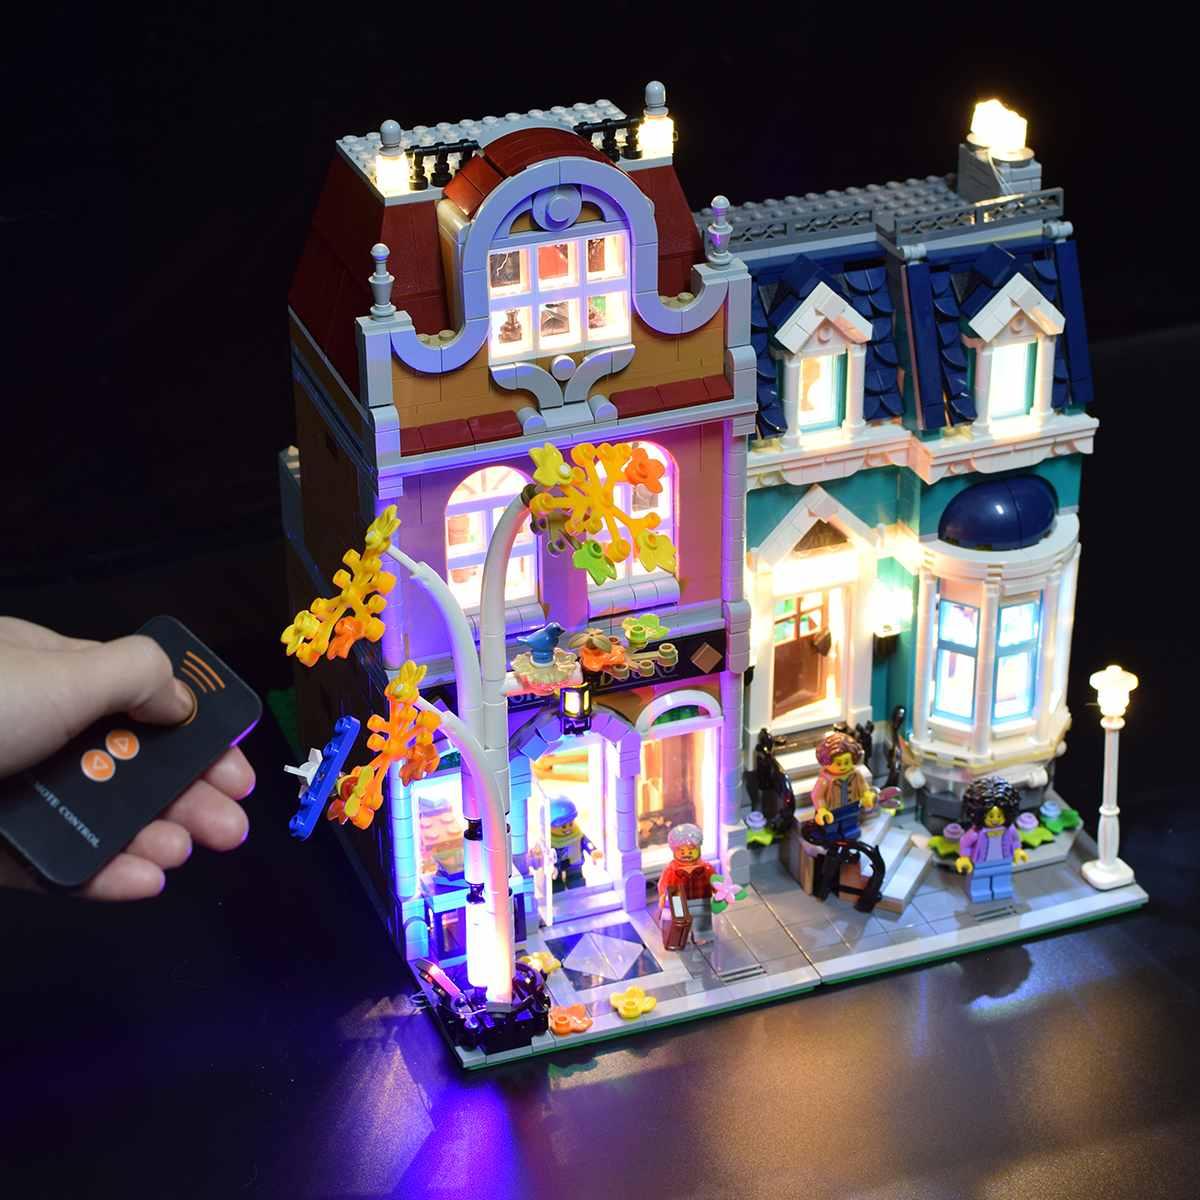 USB LED Light Lighting Kit For LEGO 10270 Creator Modular Bookshop Building